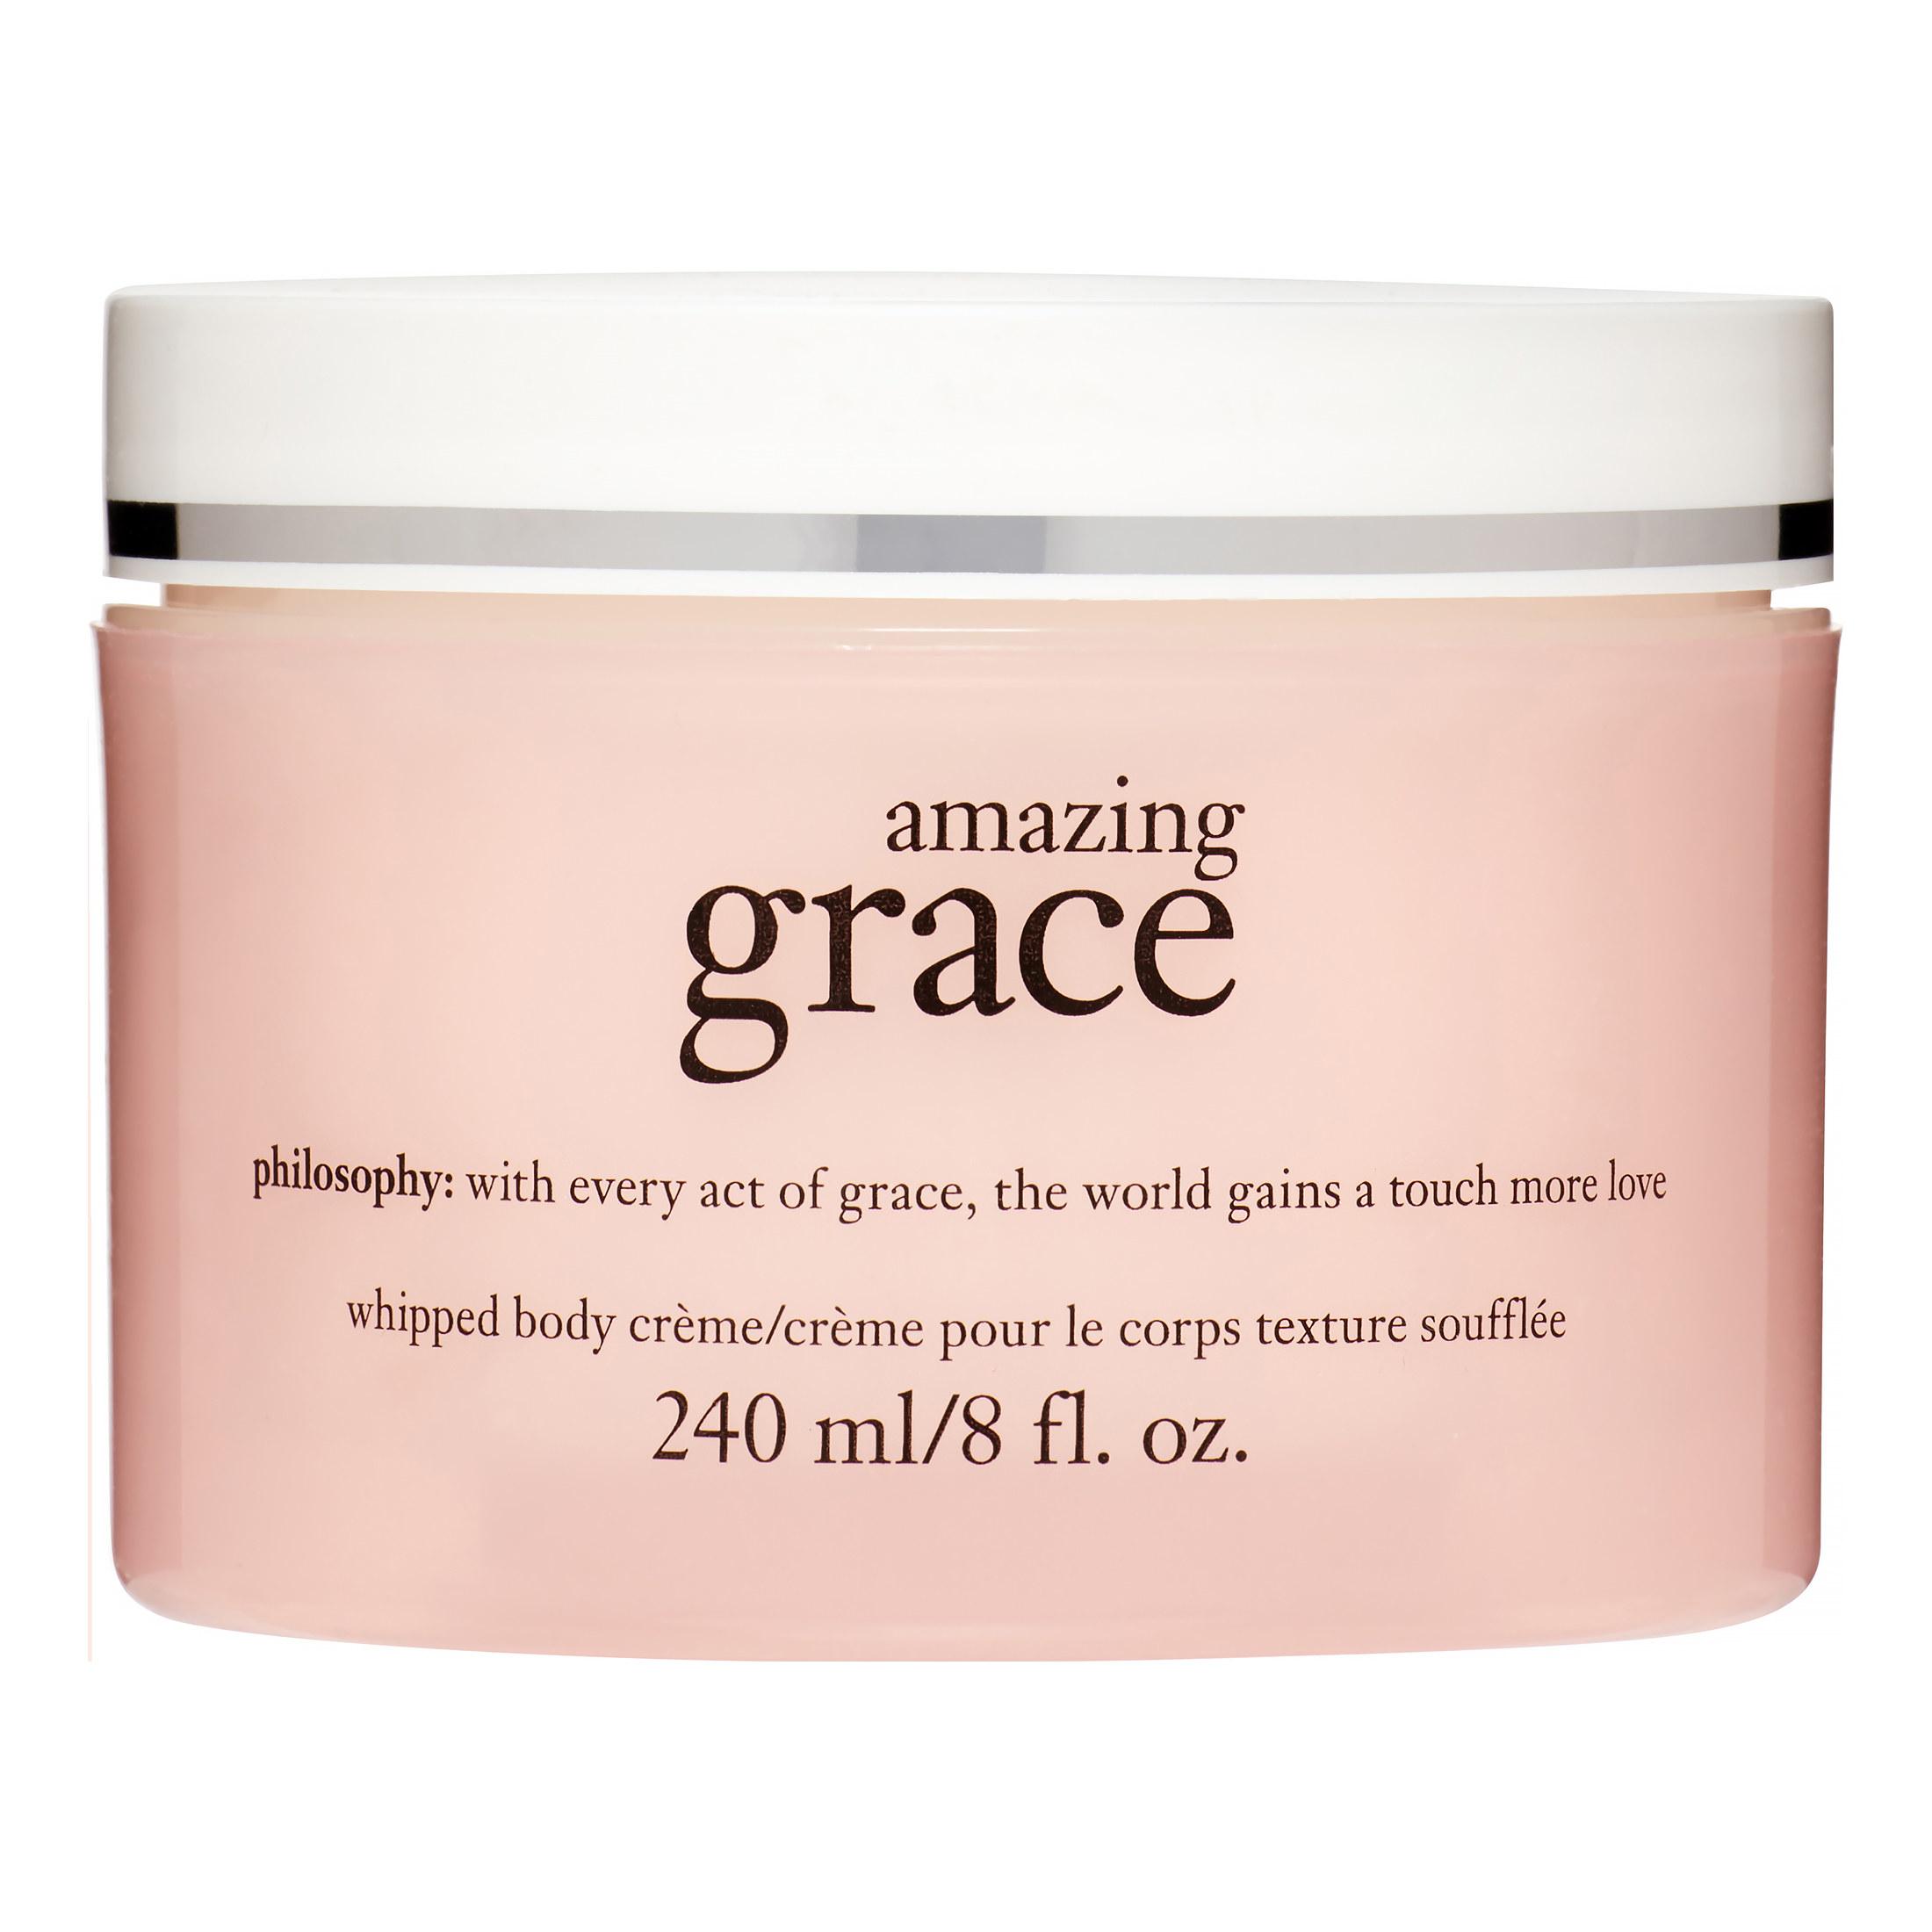 Pink jar of philosophy amazing grace whipped body cream